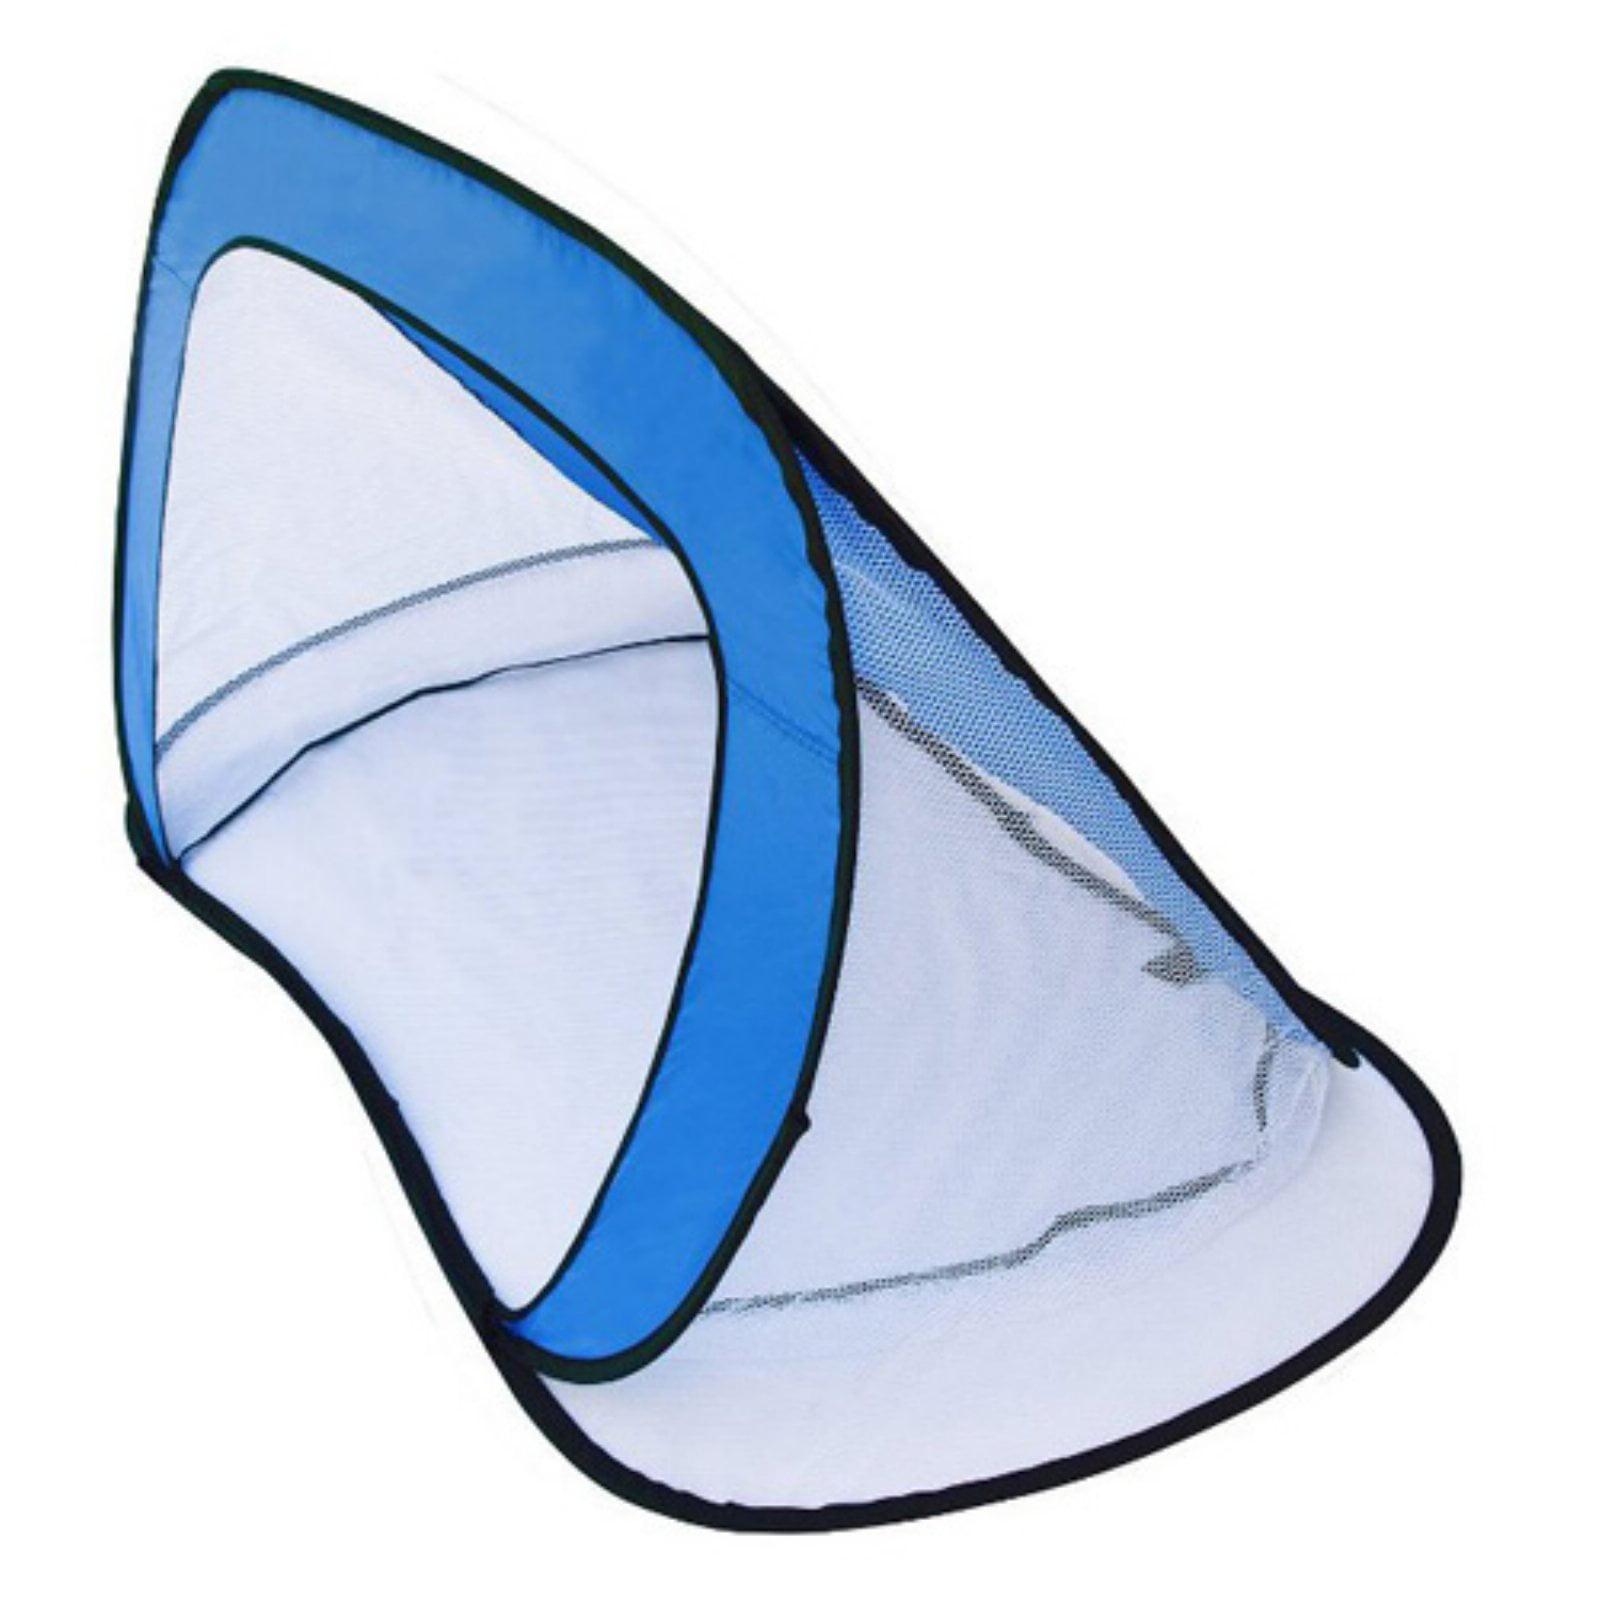 "ALEKO 2PUSG03 Portable Pop-Up Soccer Goal and Net with Carry Bag, 28"" x 52"", Set of 2, Blue"